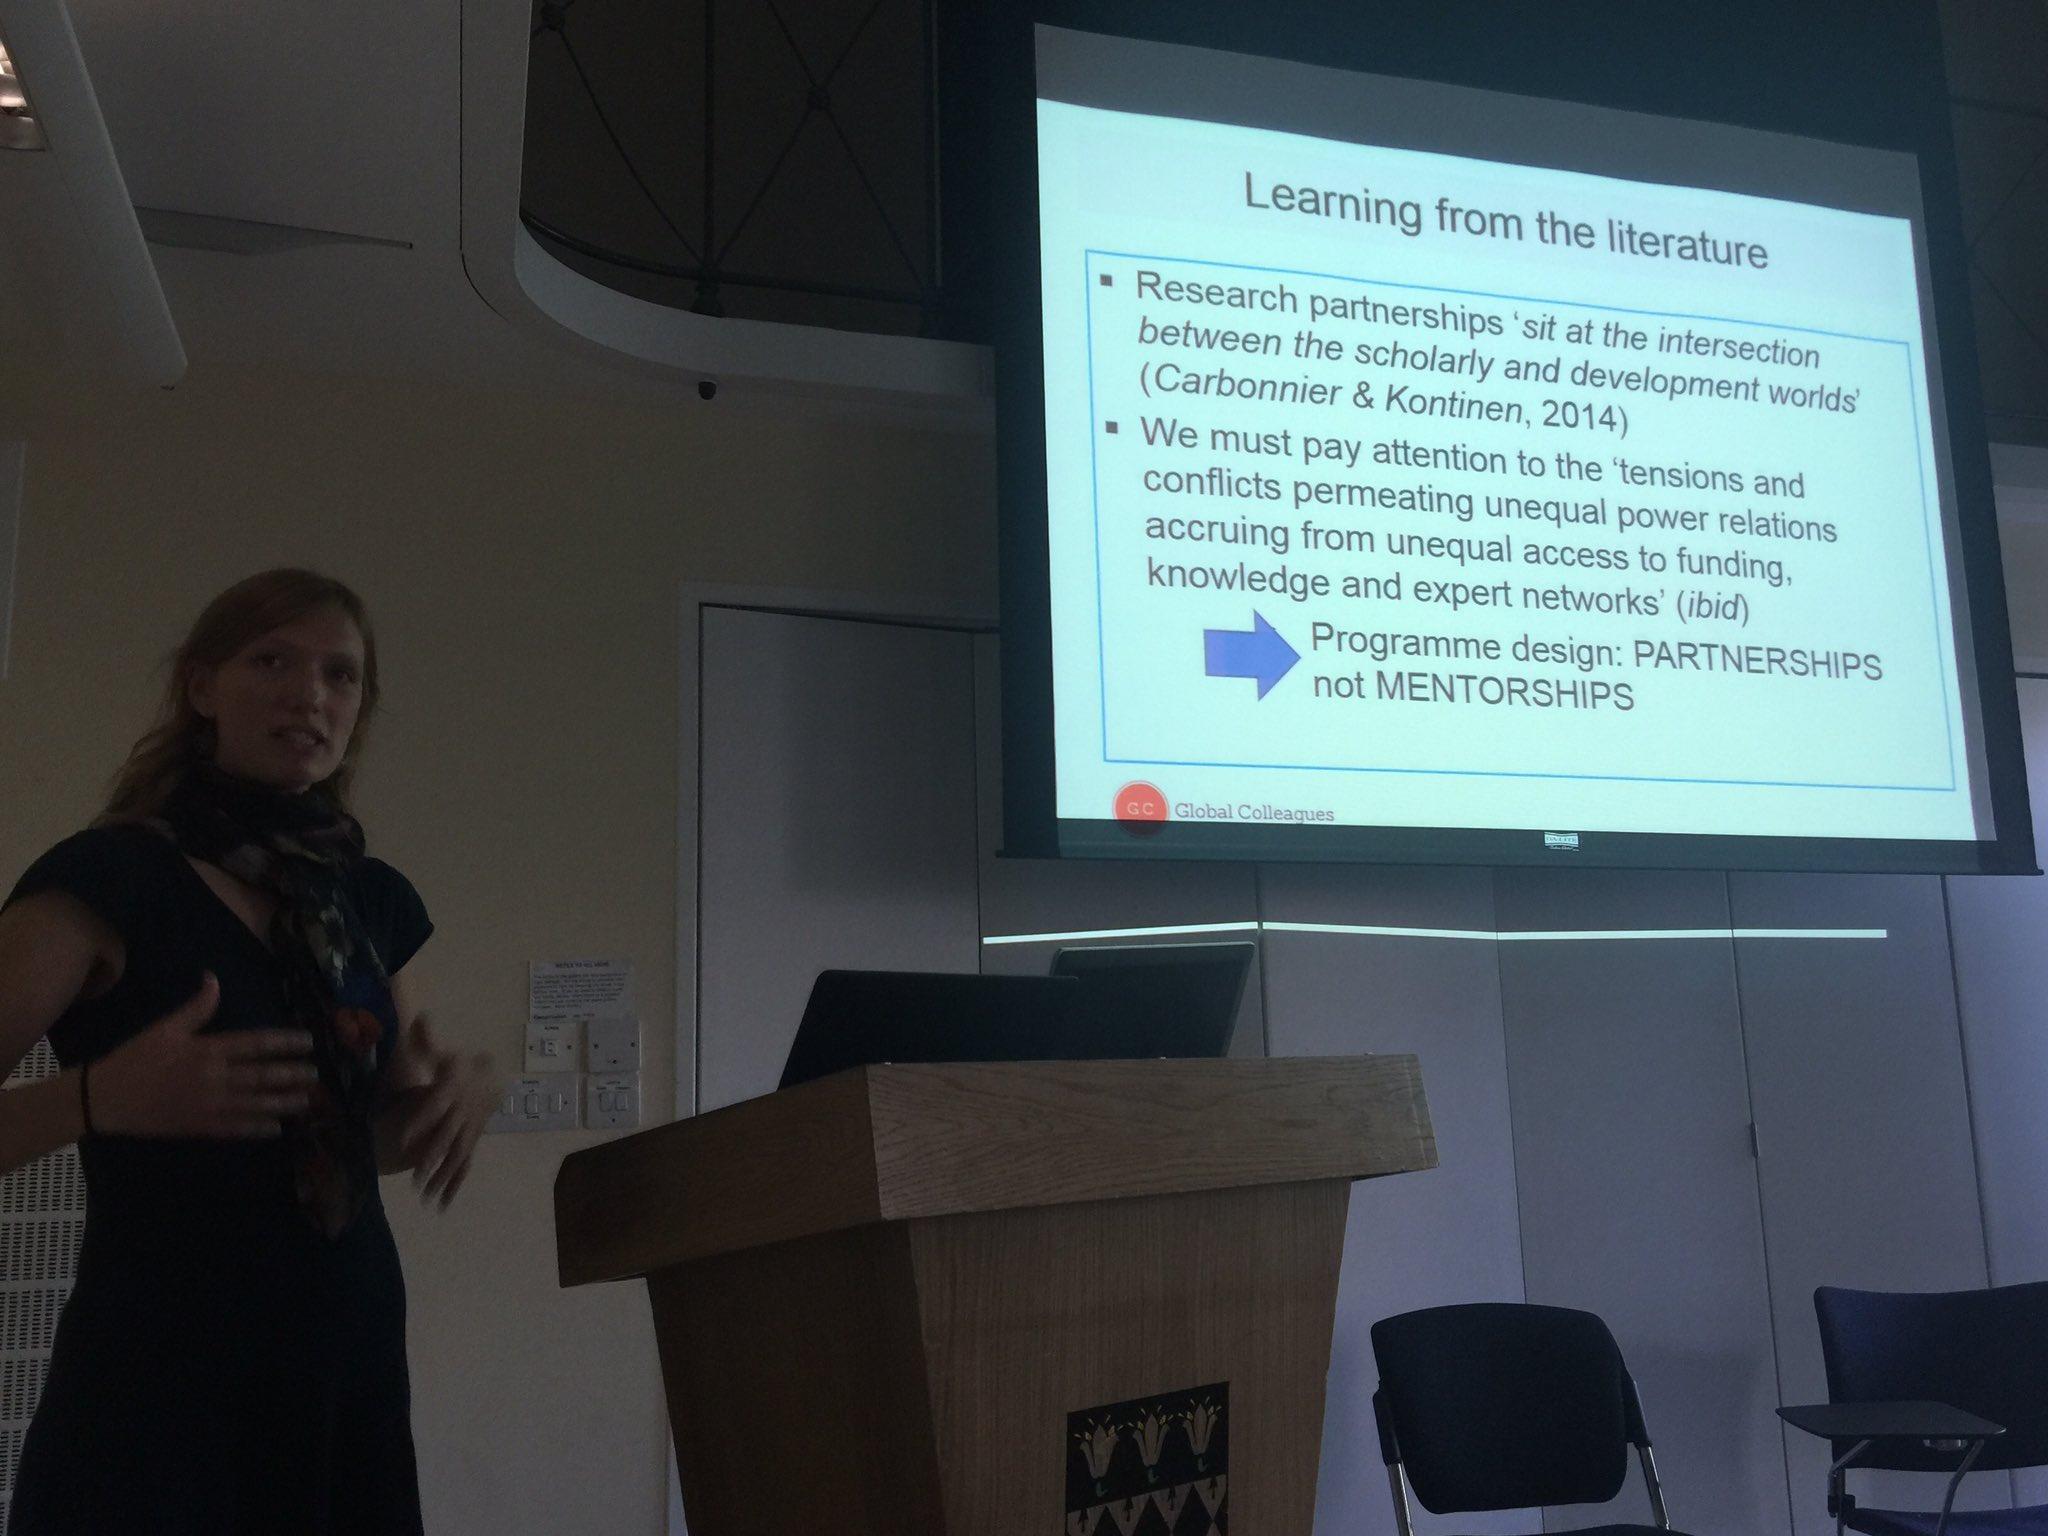 #DSA2016 #P68 #Partnership #Power Ruth Blackshaw on collaborative academics partnerships North-South; +/- senior https://t.co/hgoOVww0d0